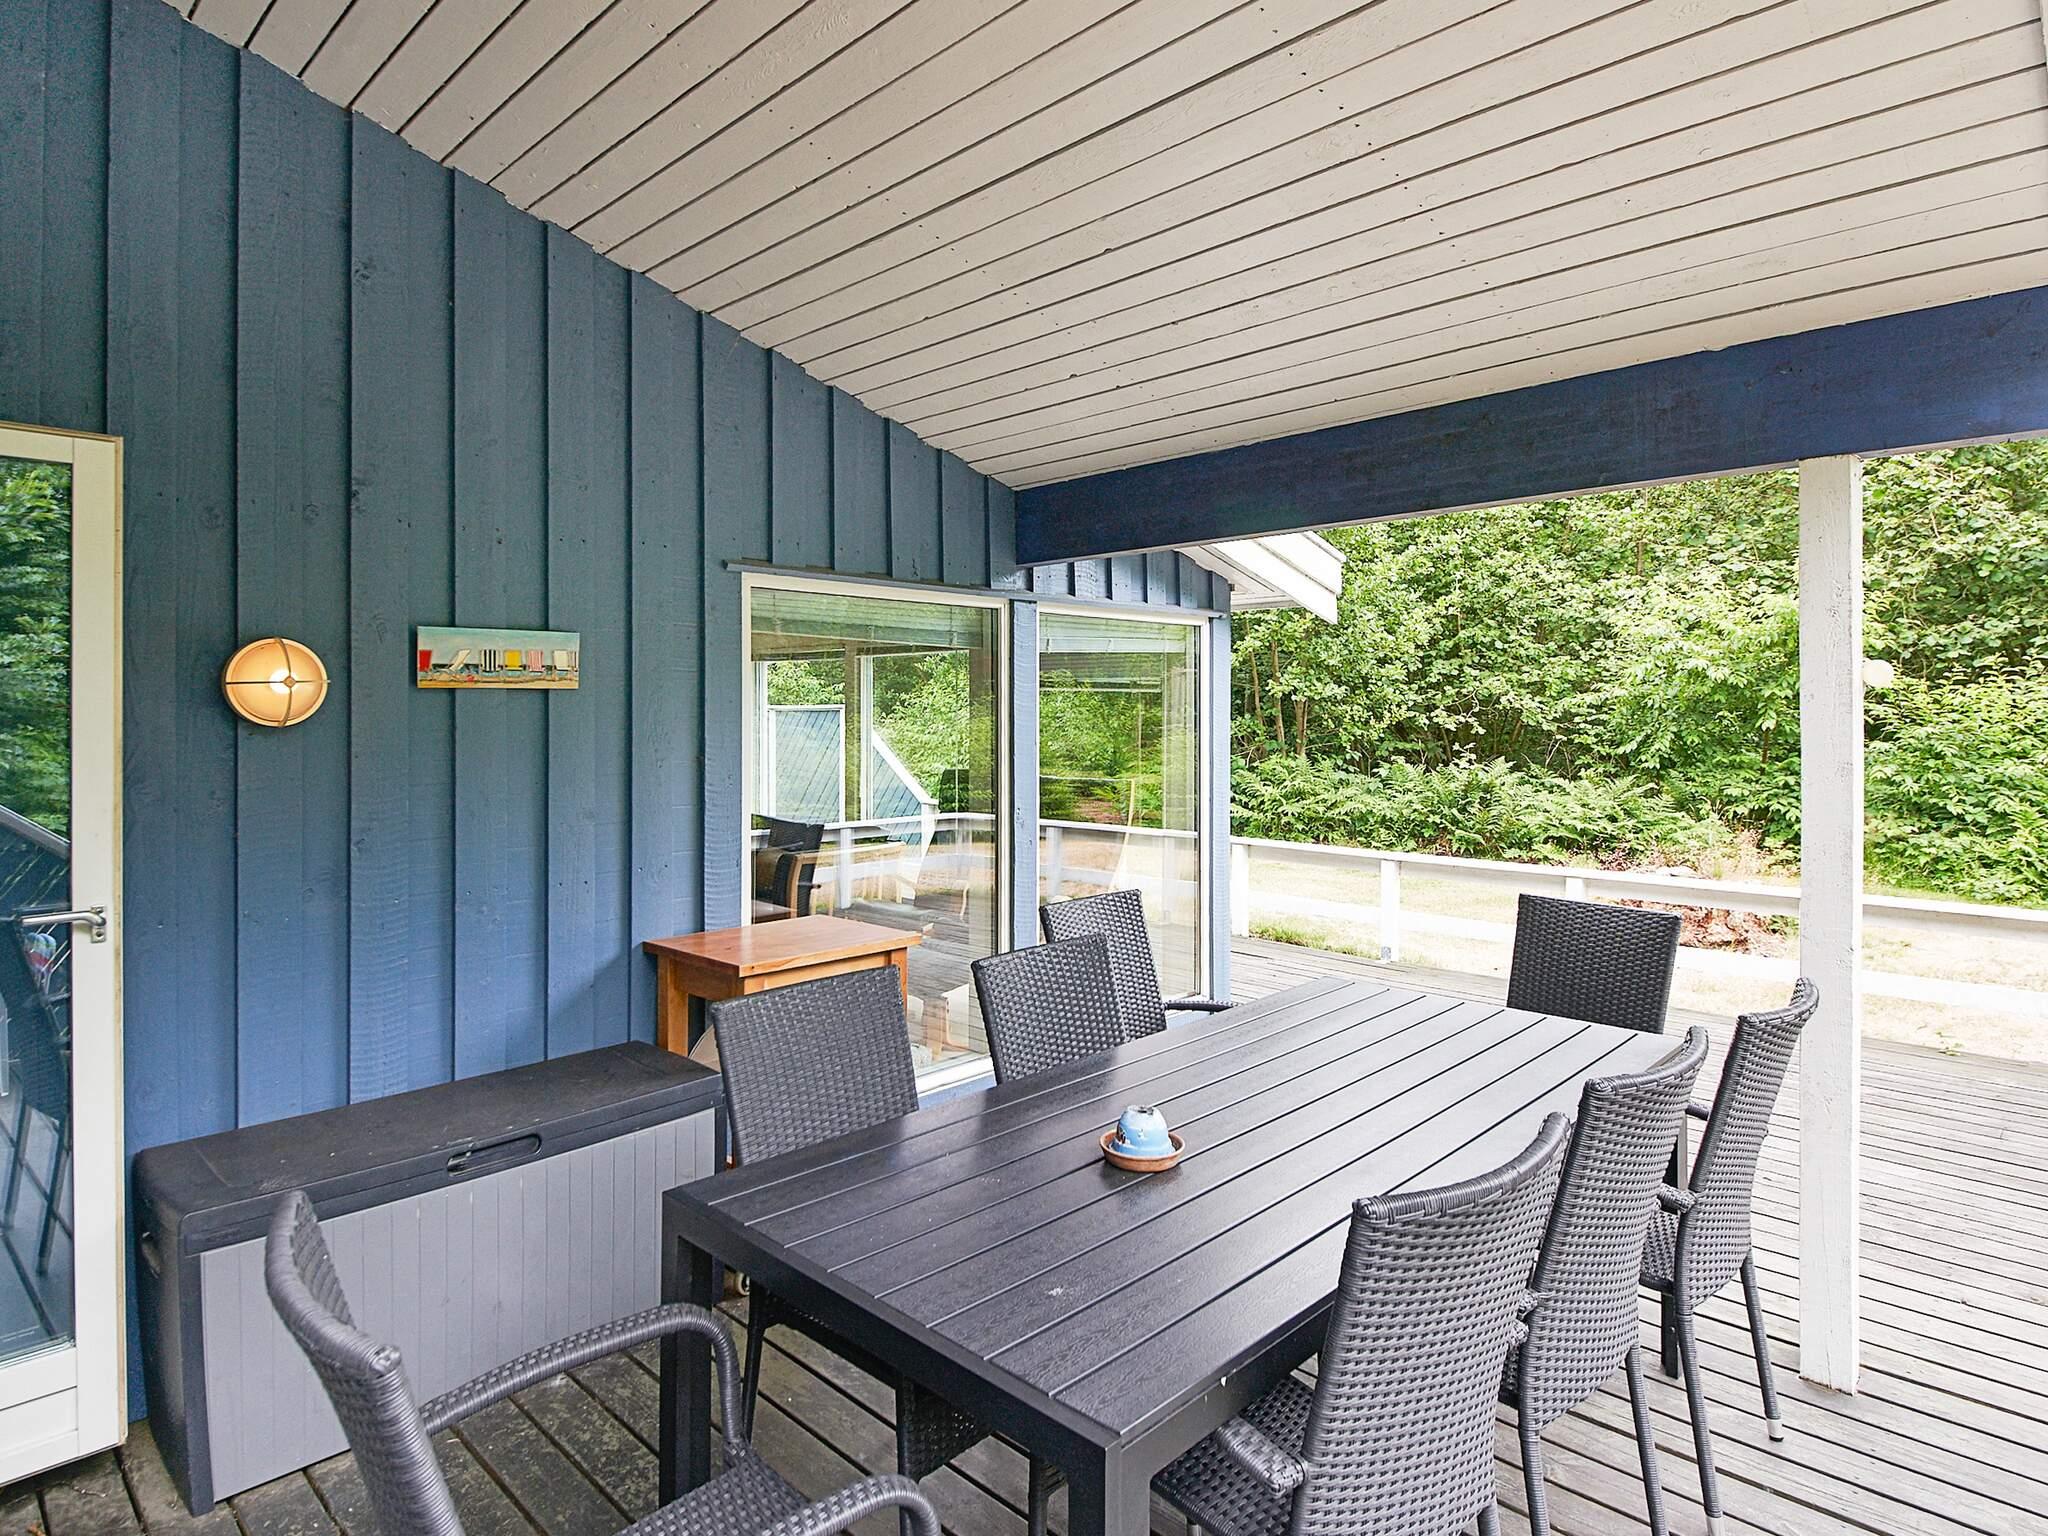 Maison de vacances Østre Sømarken (82551), Aakirkeby, , Bornholm, Danemark, image 14